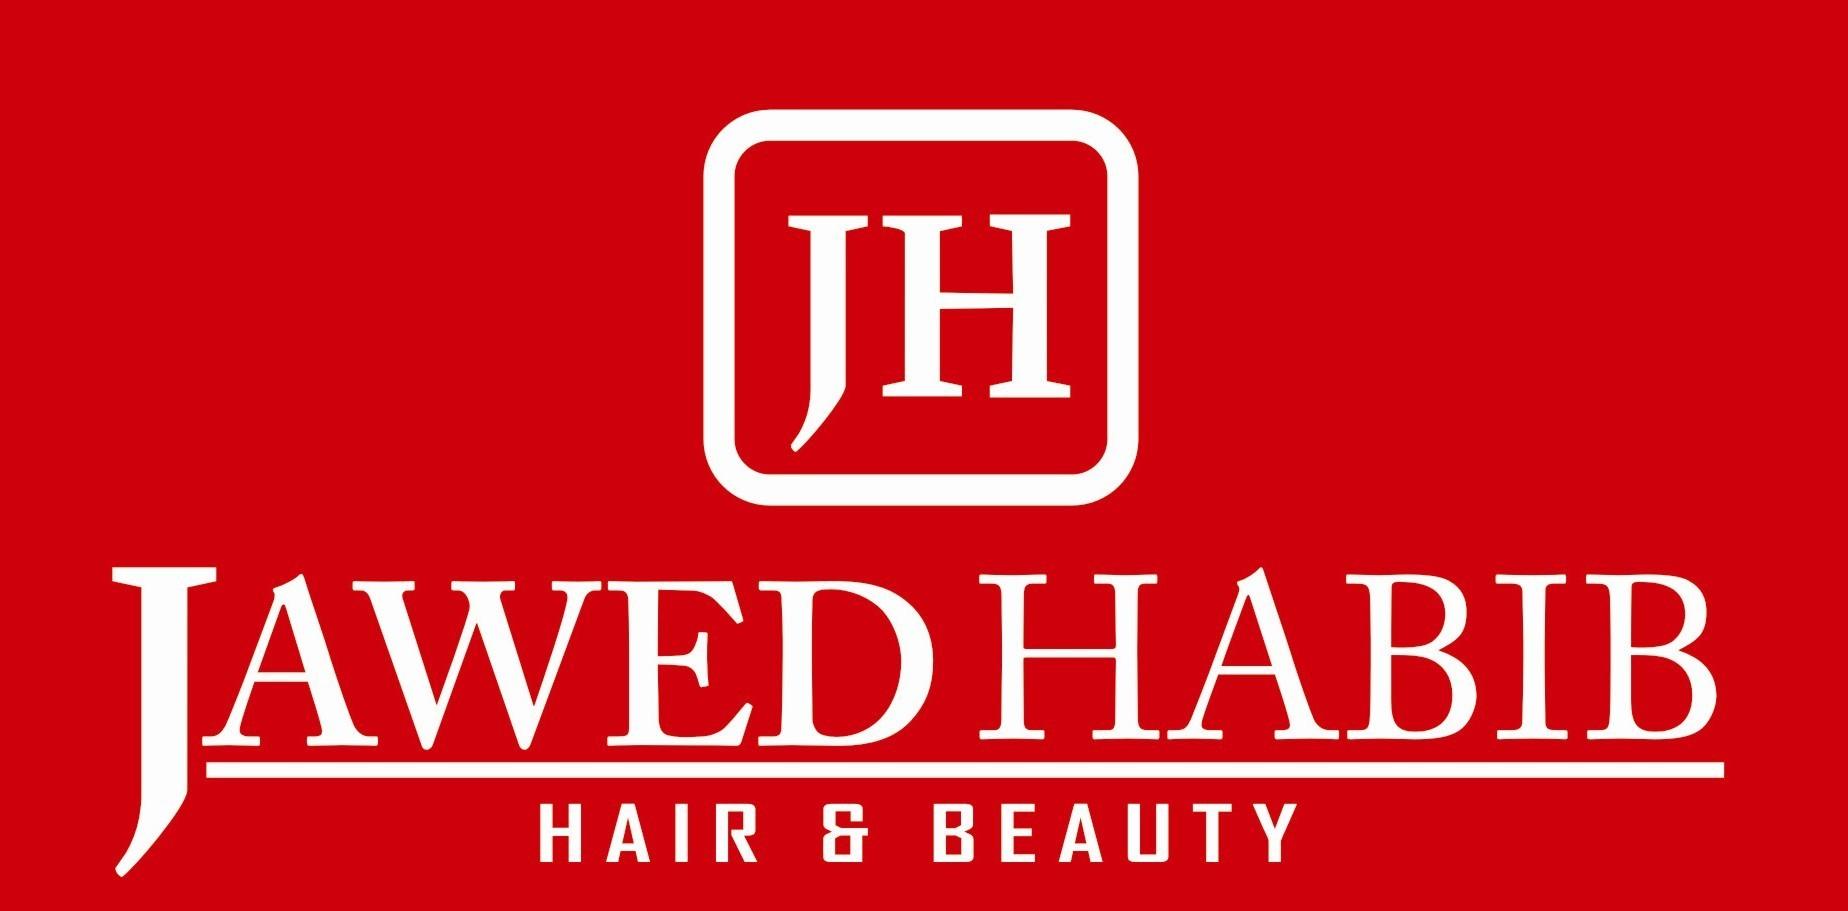 Jawed Habib Hair & Beauty Salons - Ajit Street - Navsari Image